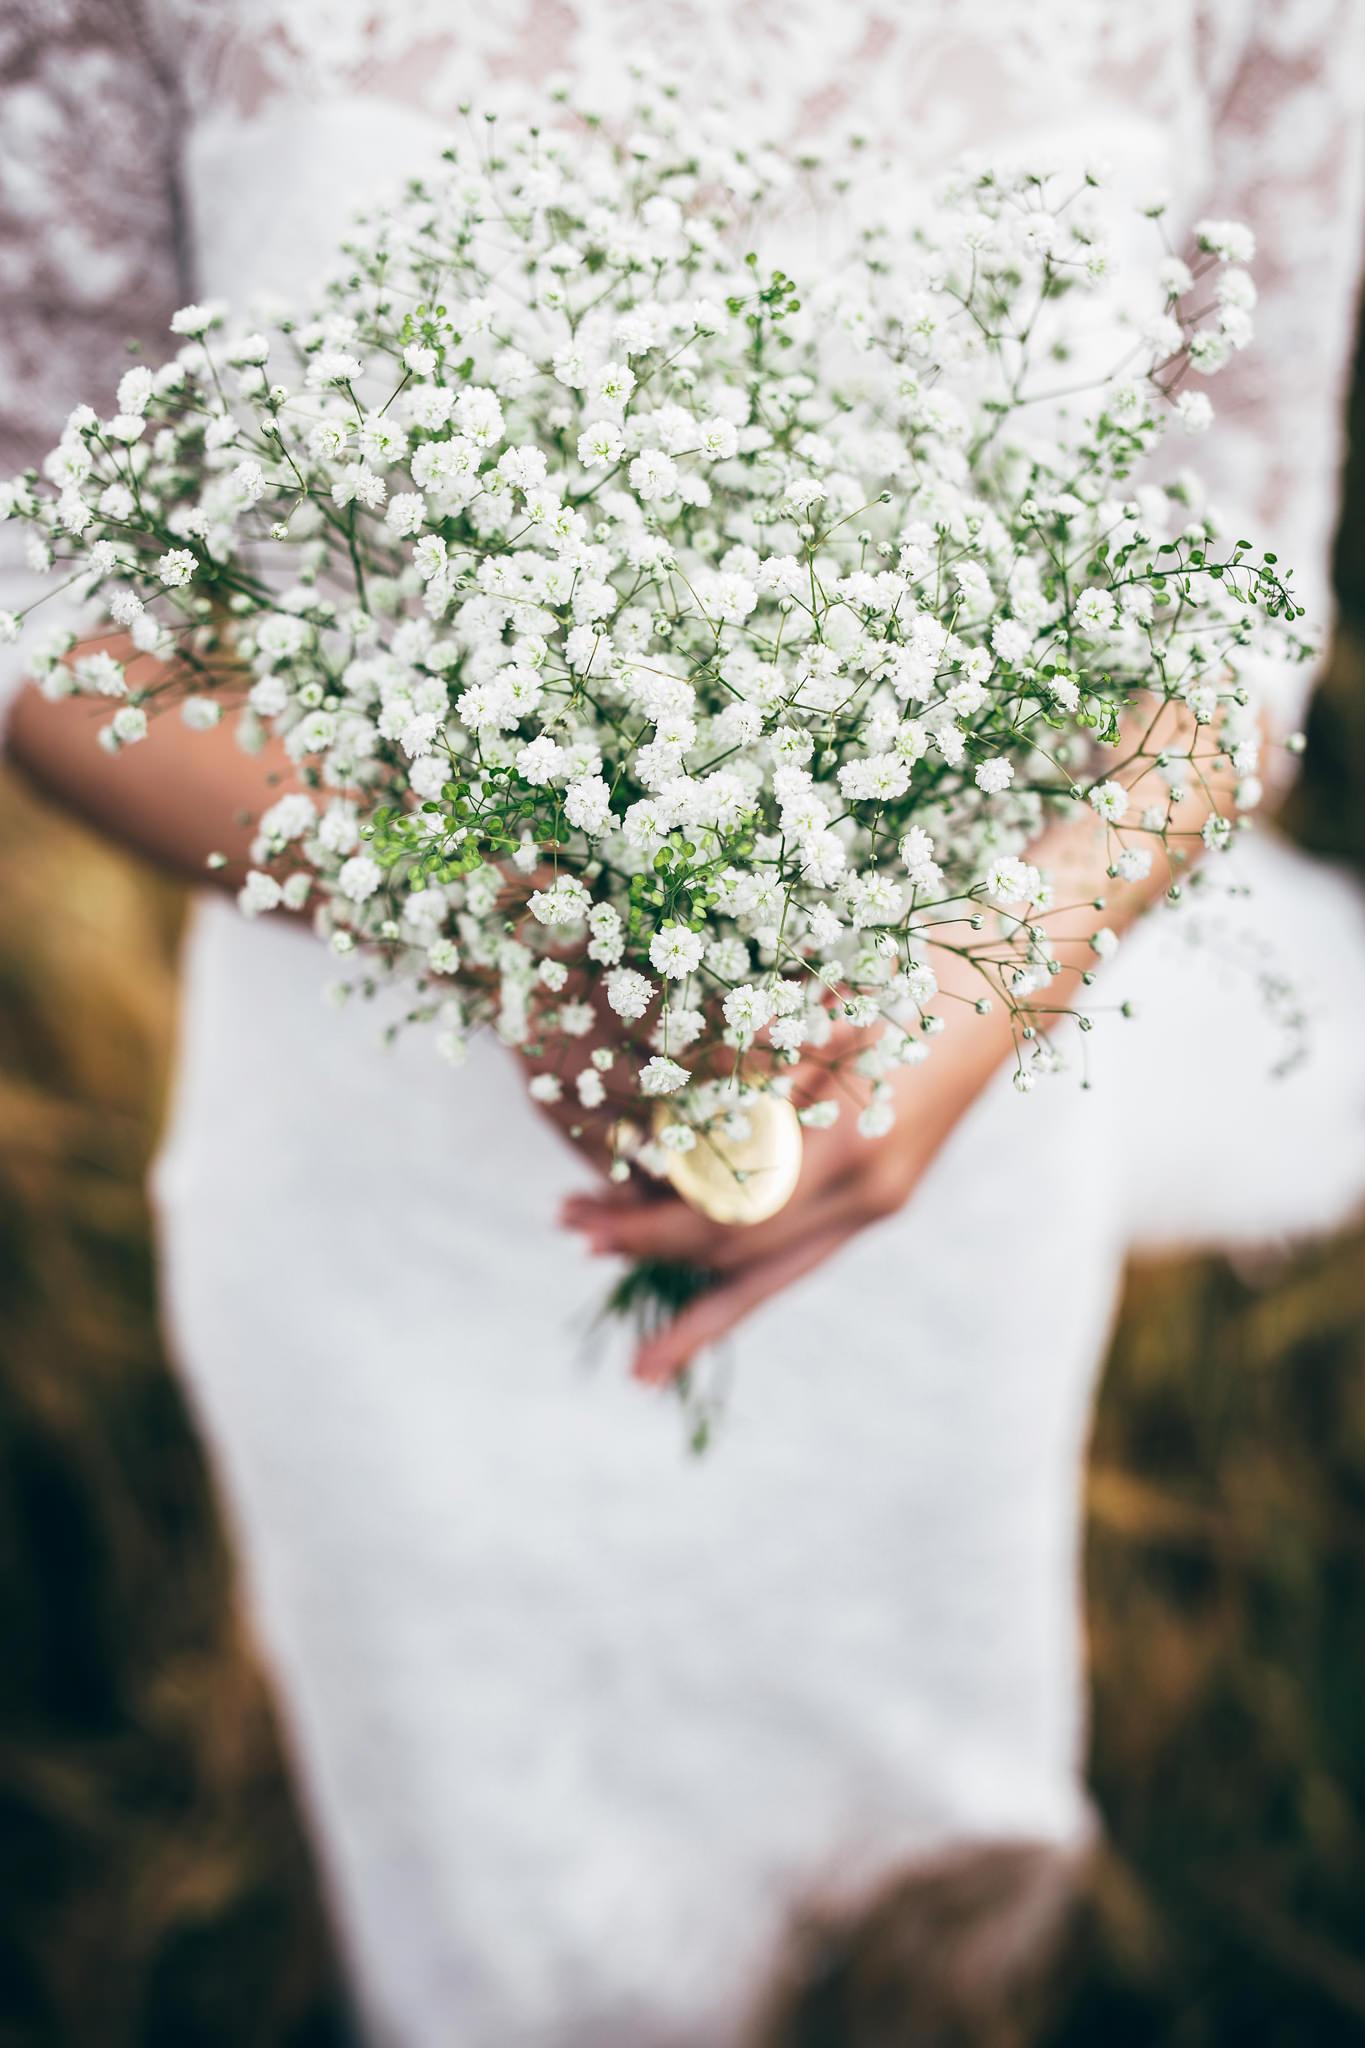 Norway+wedding+photographer+elopement+pre+wedding+Casey+Arneson-78.jpg